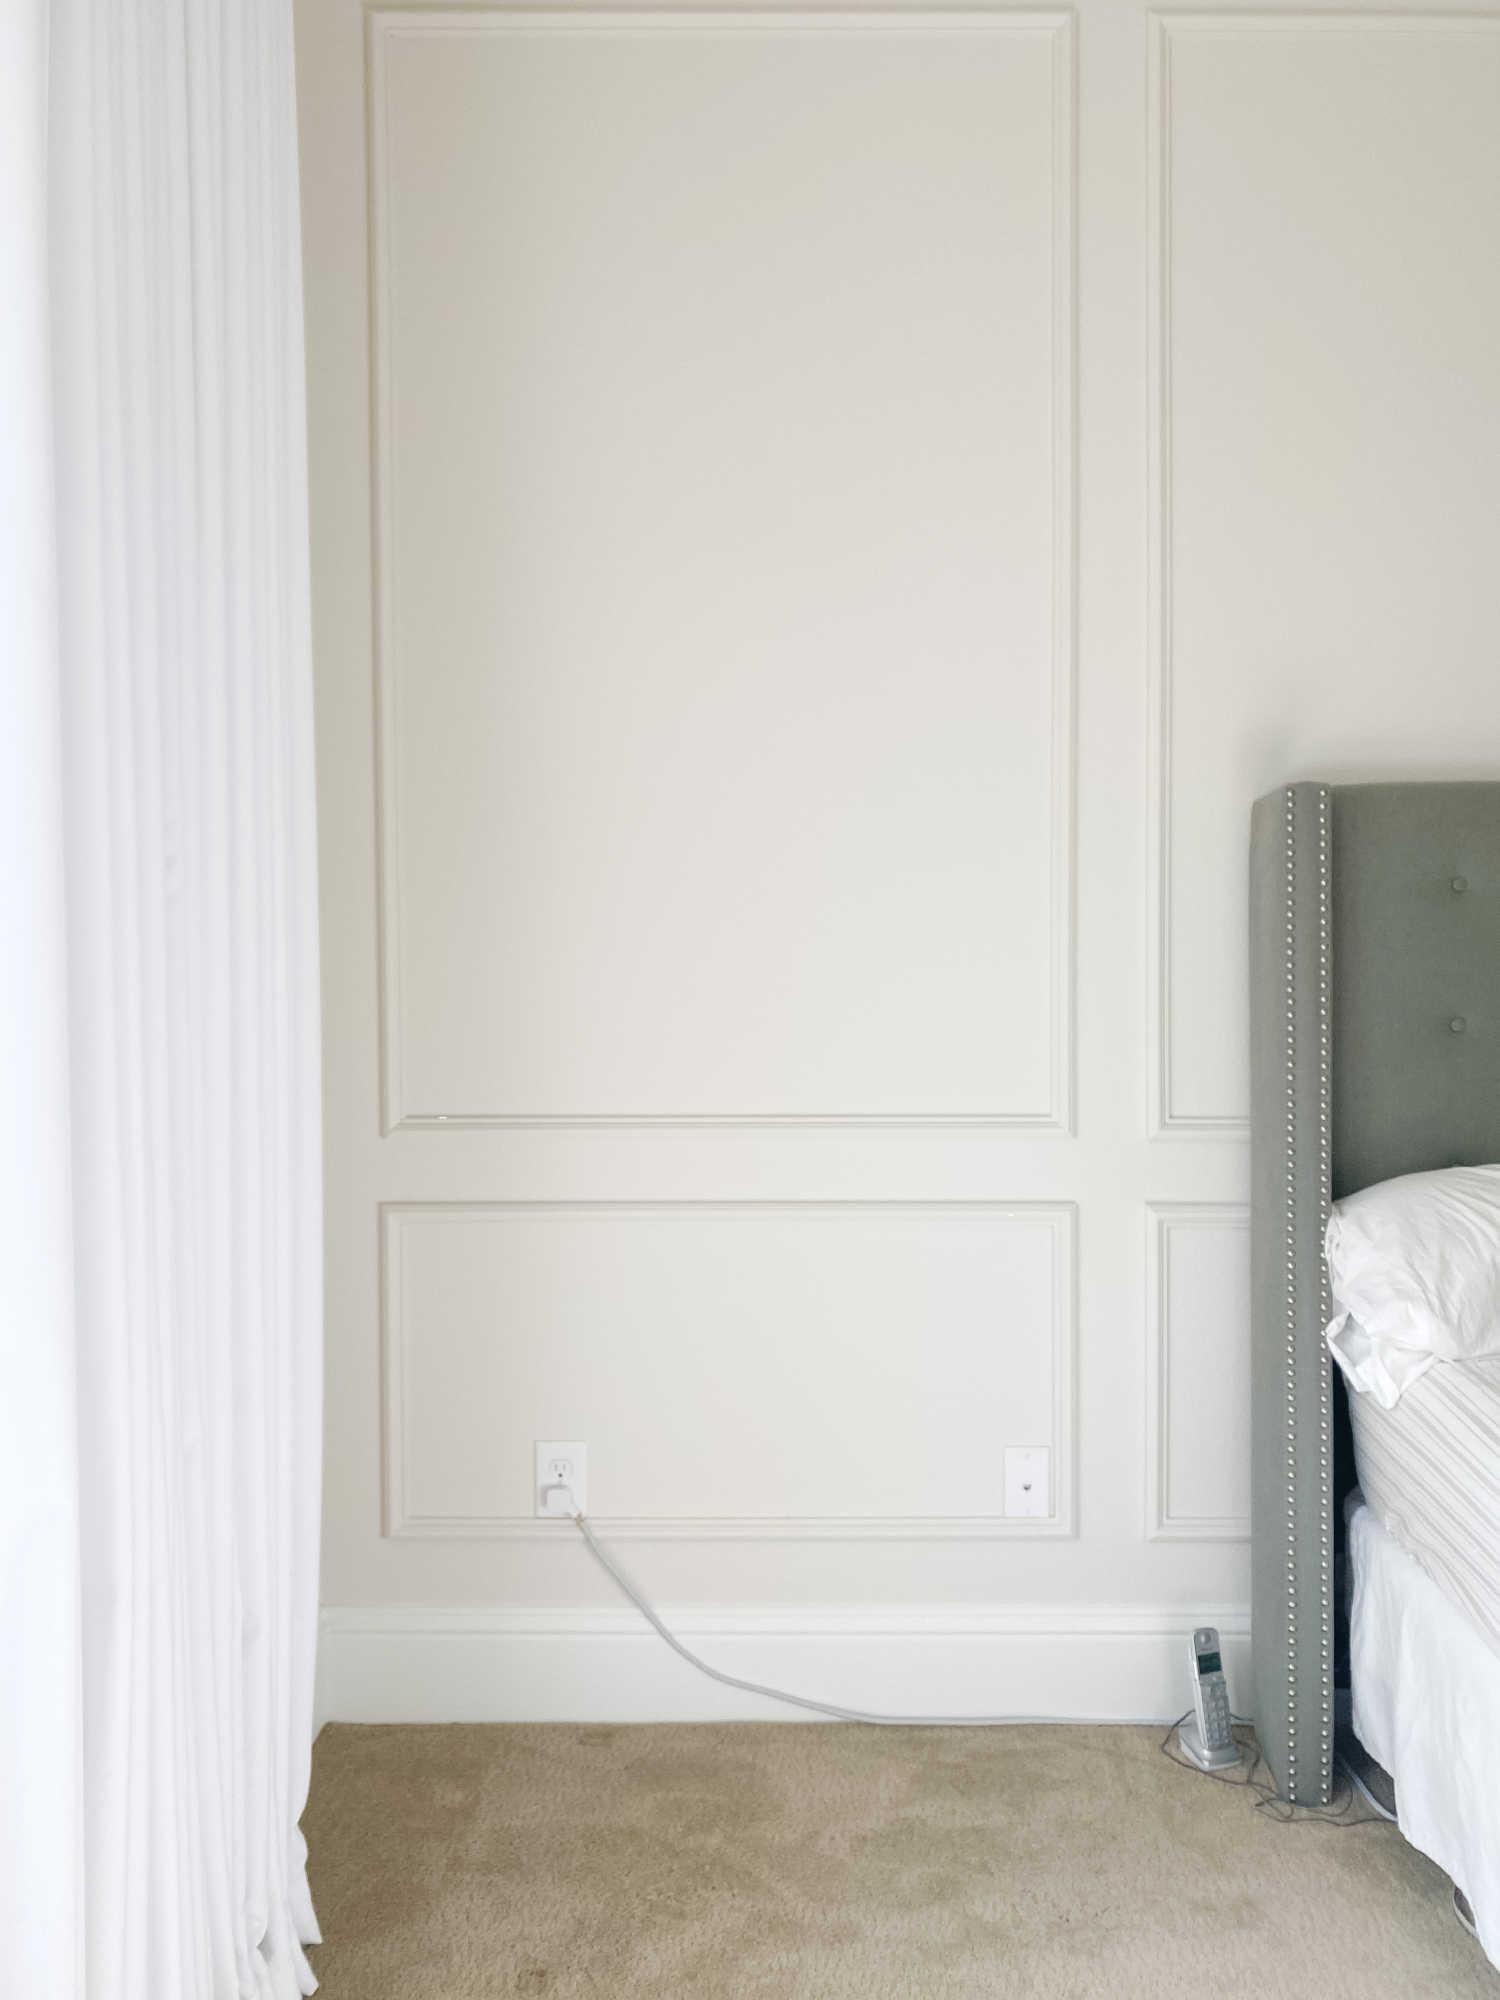 more bedroom changes